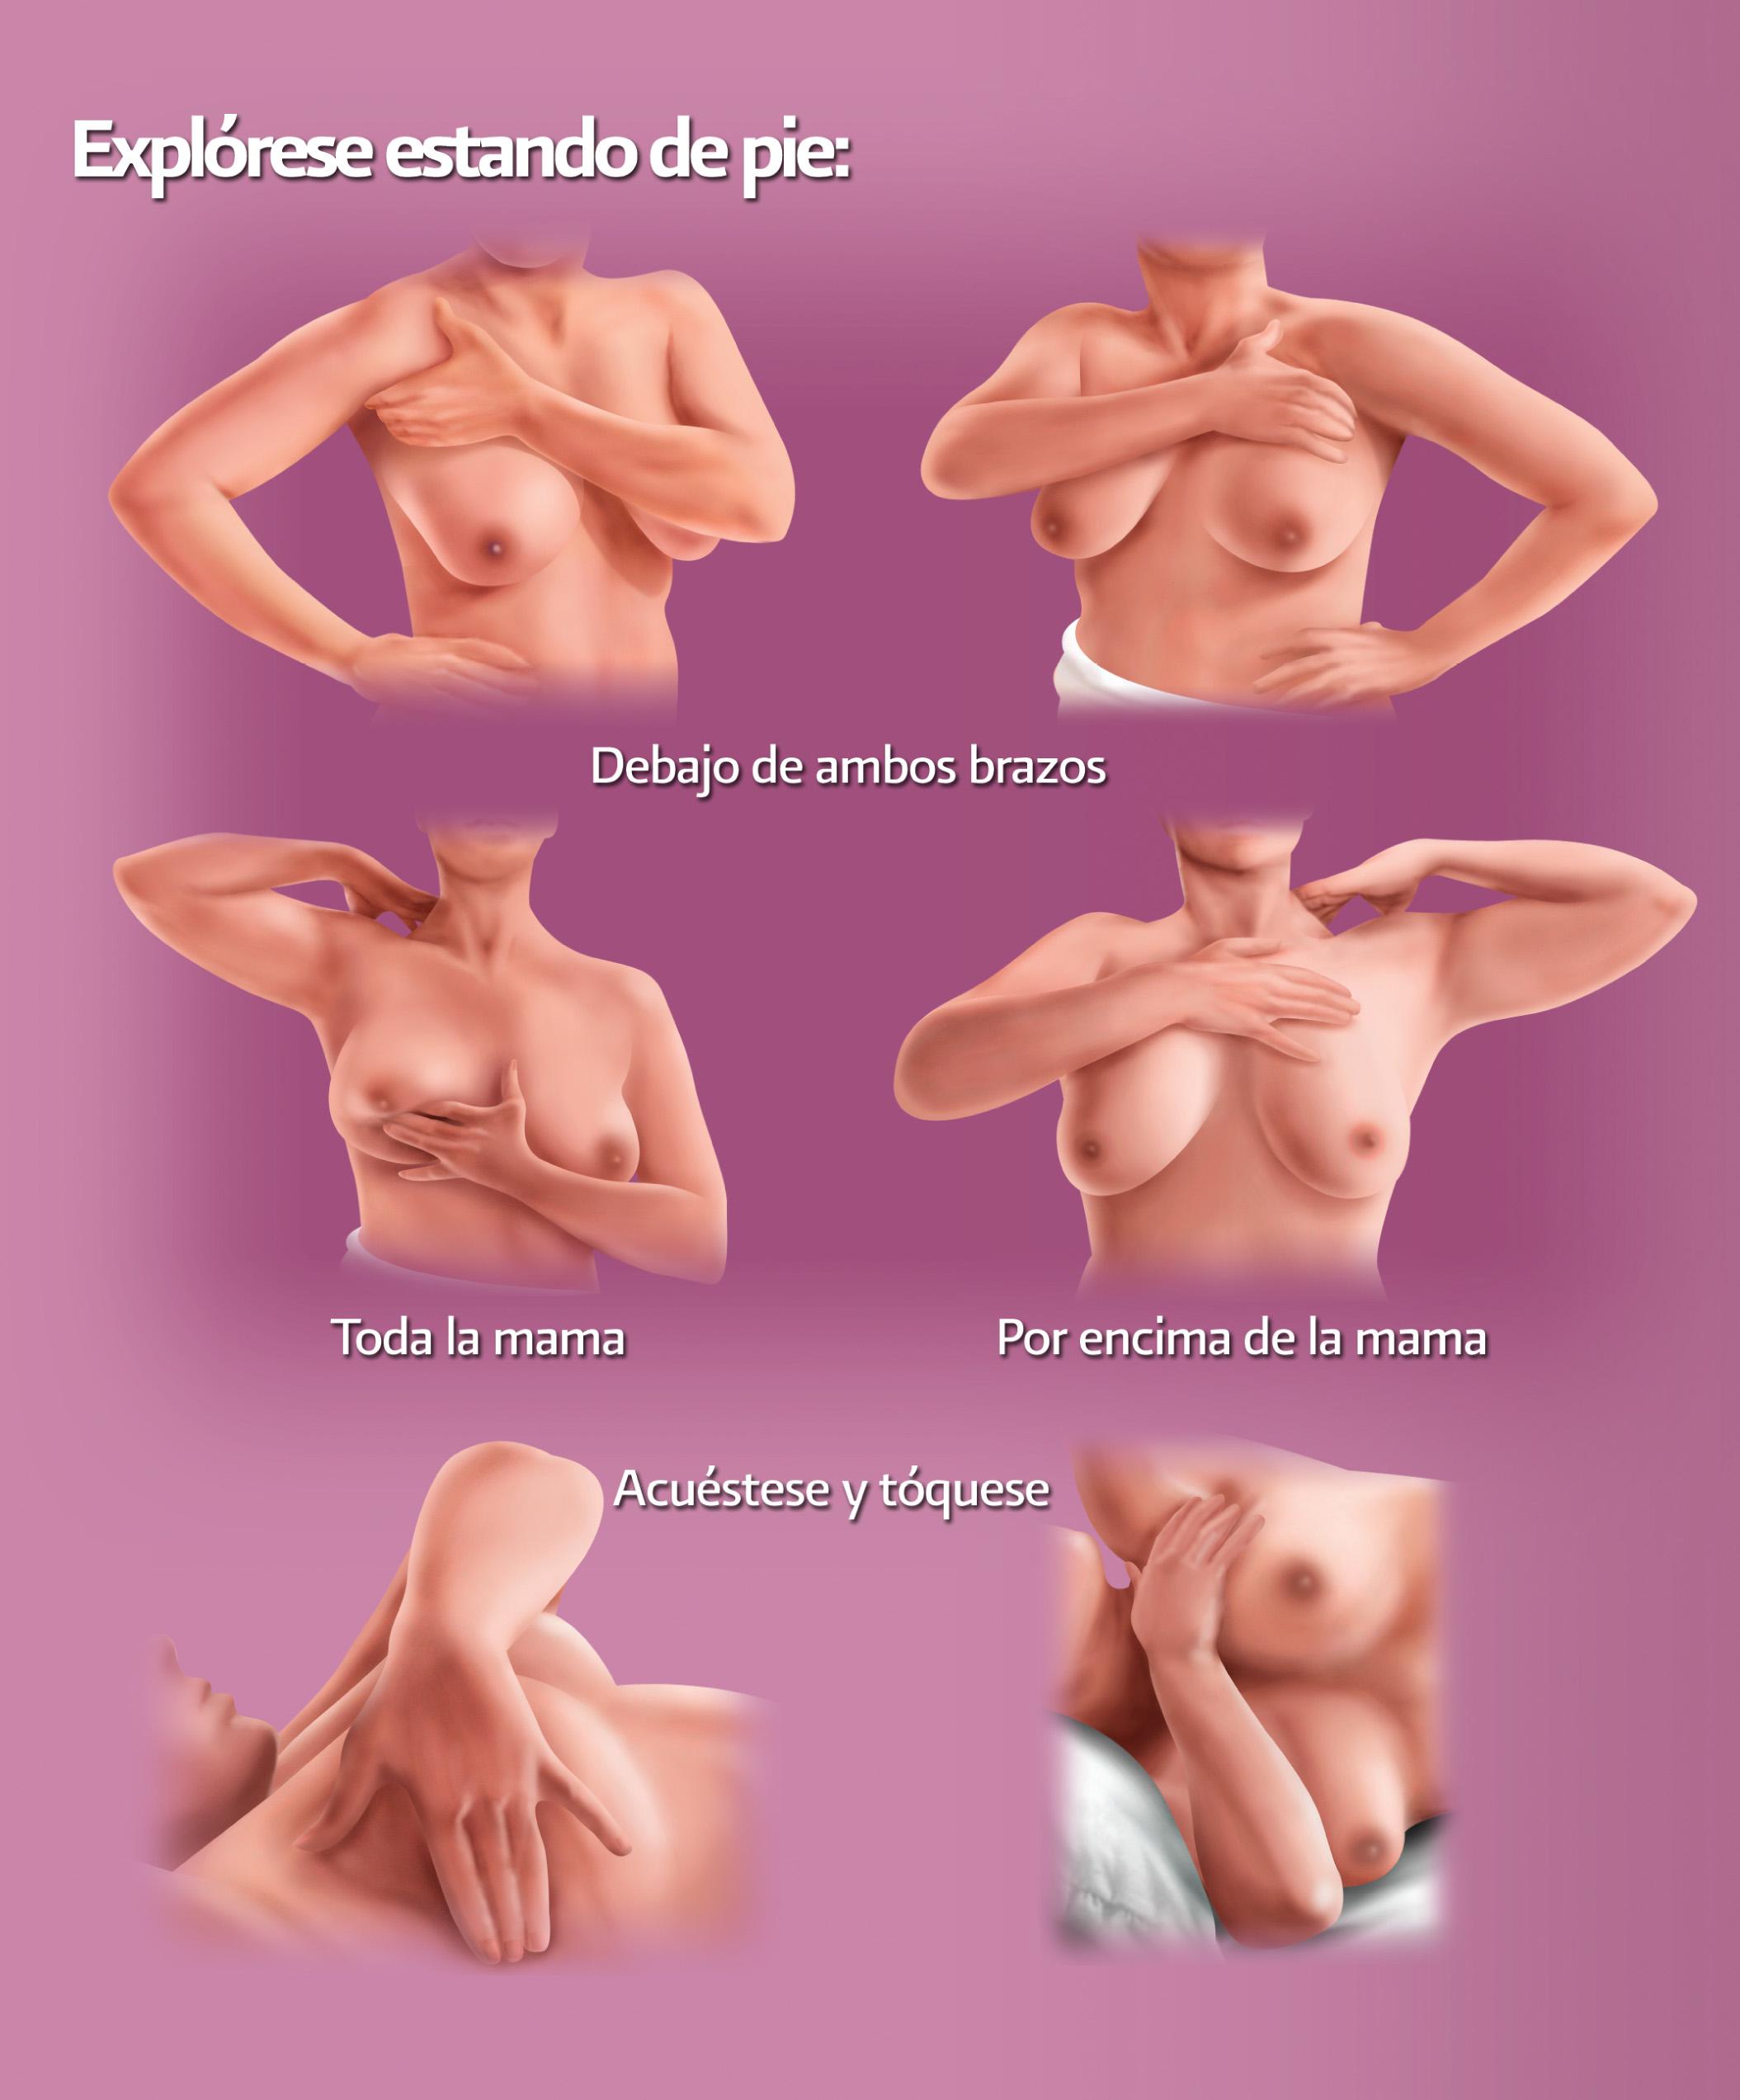 cancerul mamar forme clinice oxiuros medidas higienicas